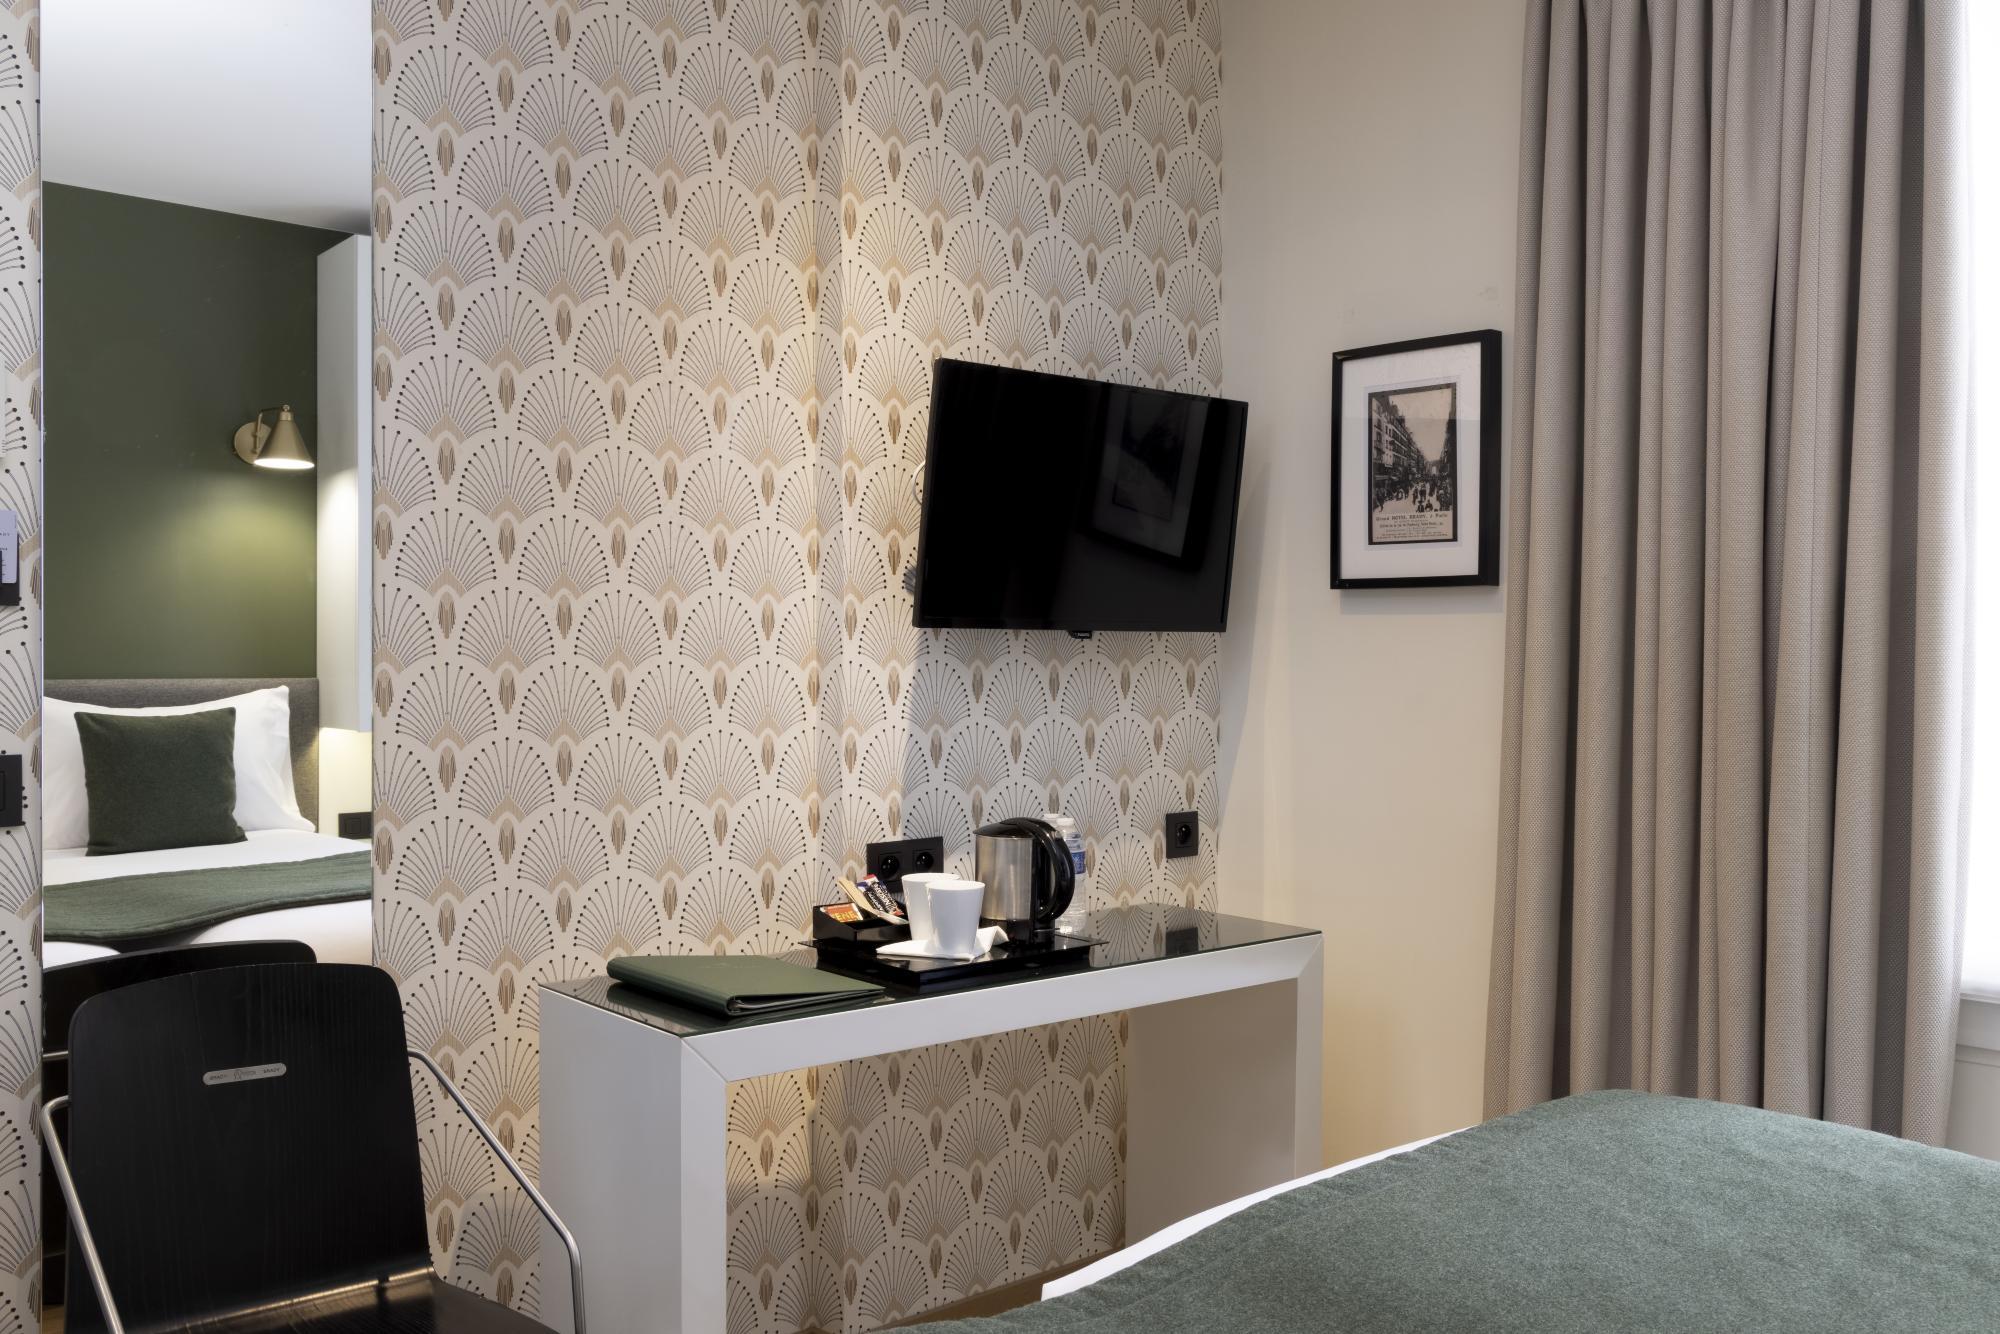 Hotel Brady Superior Room Desk